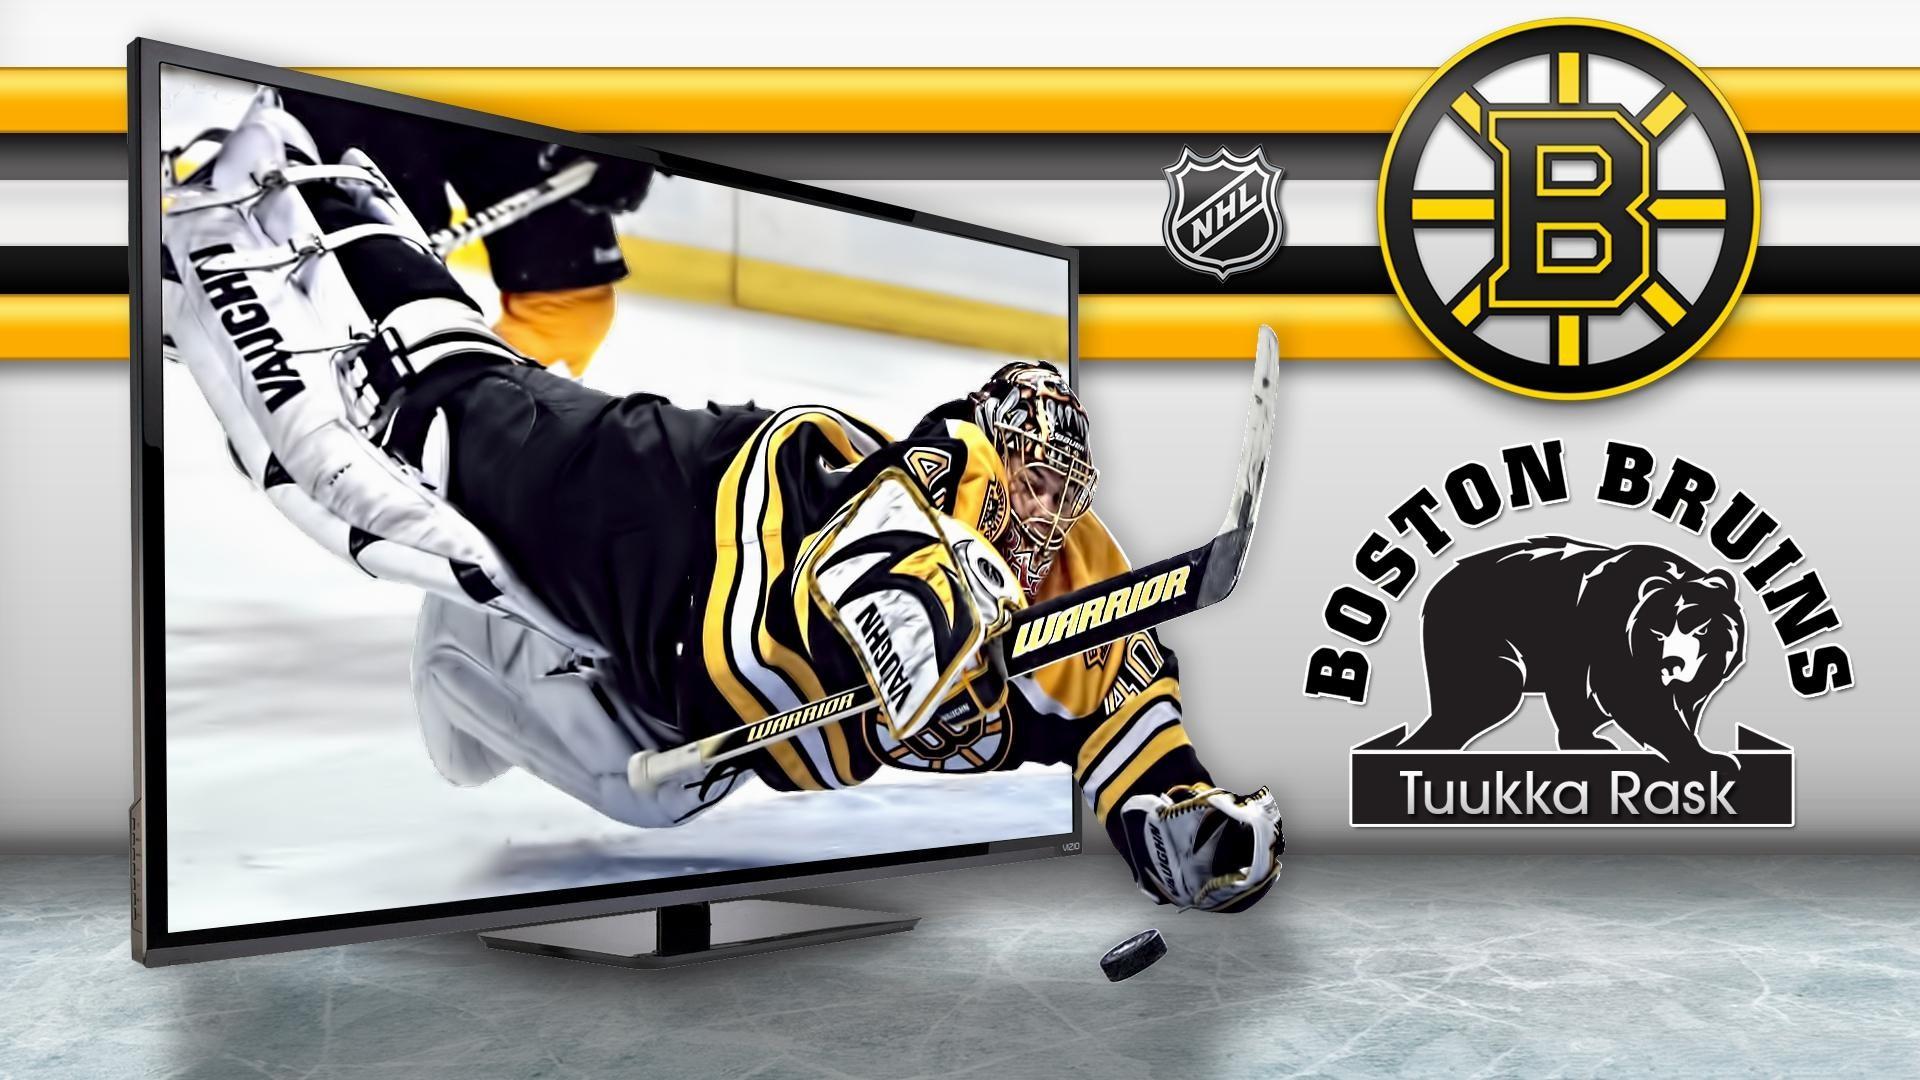 wallpaper.wiki-Free-Download-Boston-Bruins-Photo-PIC-